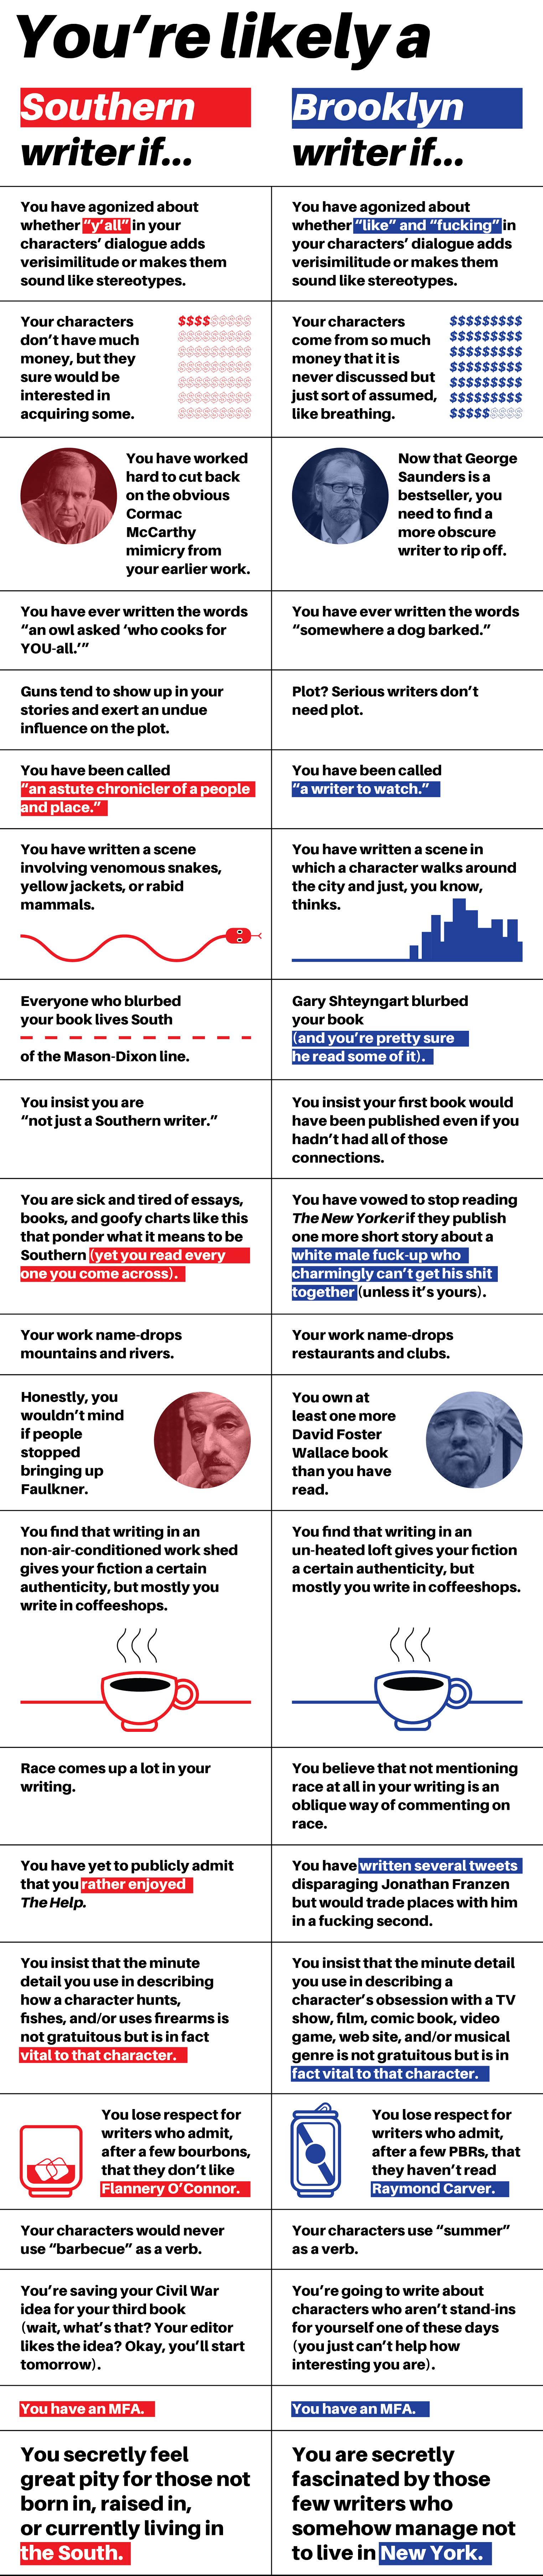 infographic fixed